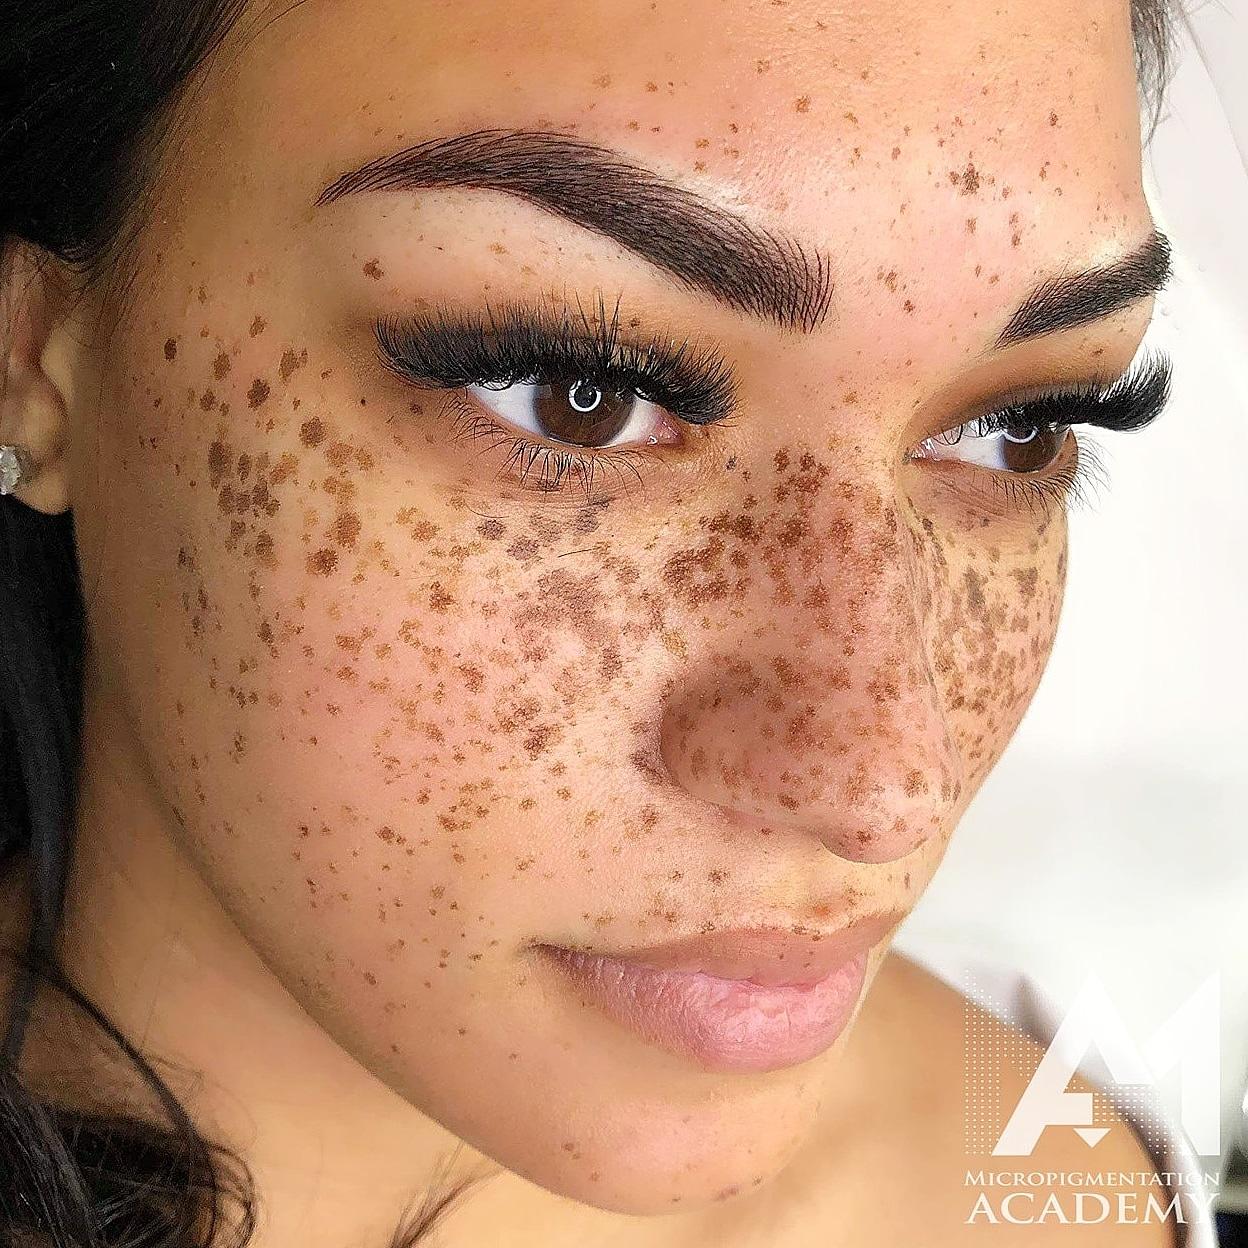 Micropigmentation Academy (Microblading- Scalp Tattoo Treatment/Training) Connecticut image 1